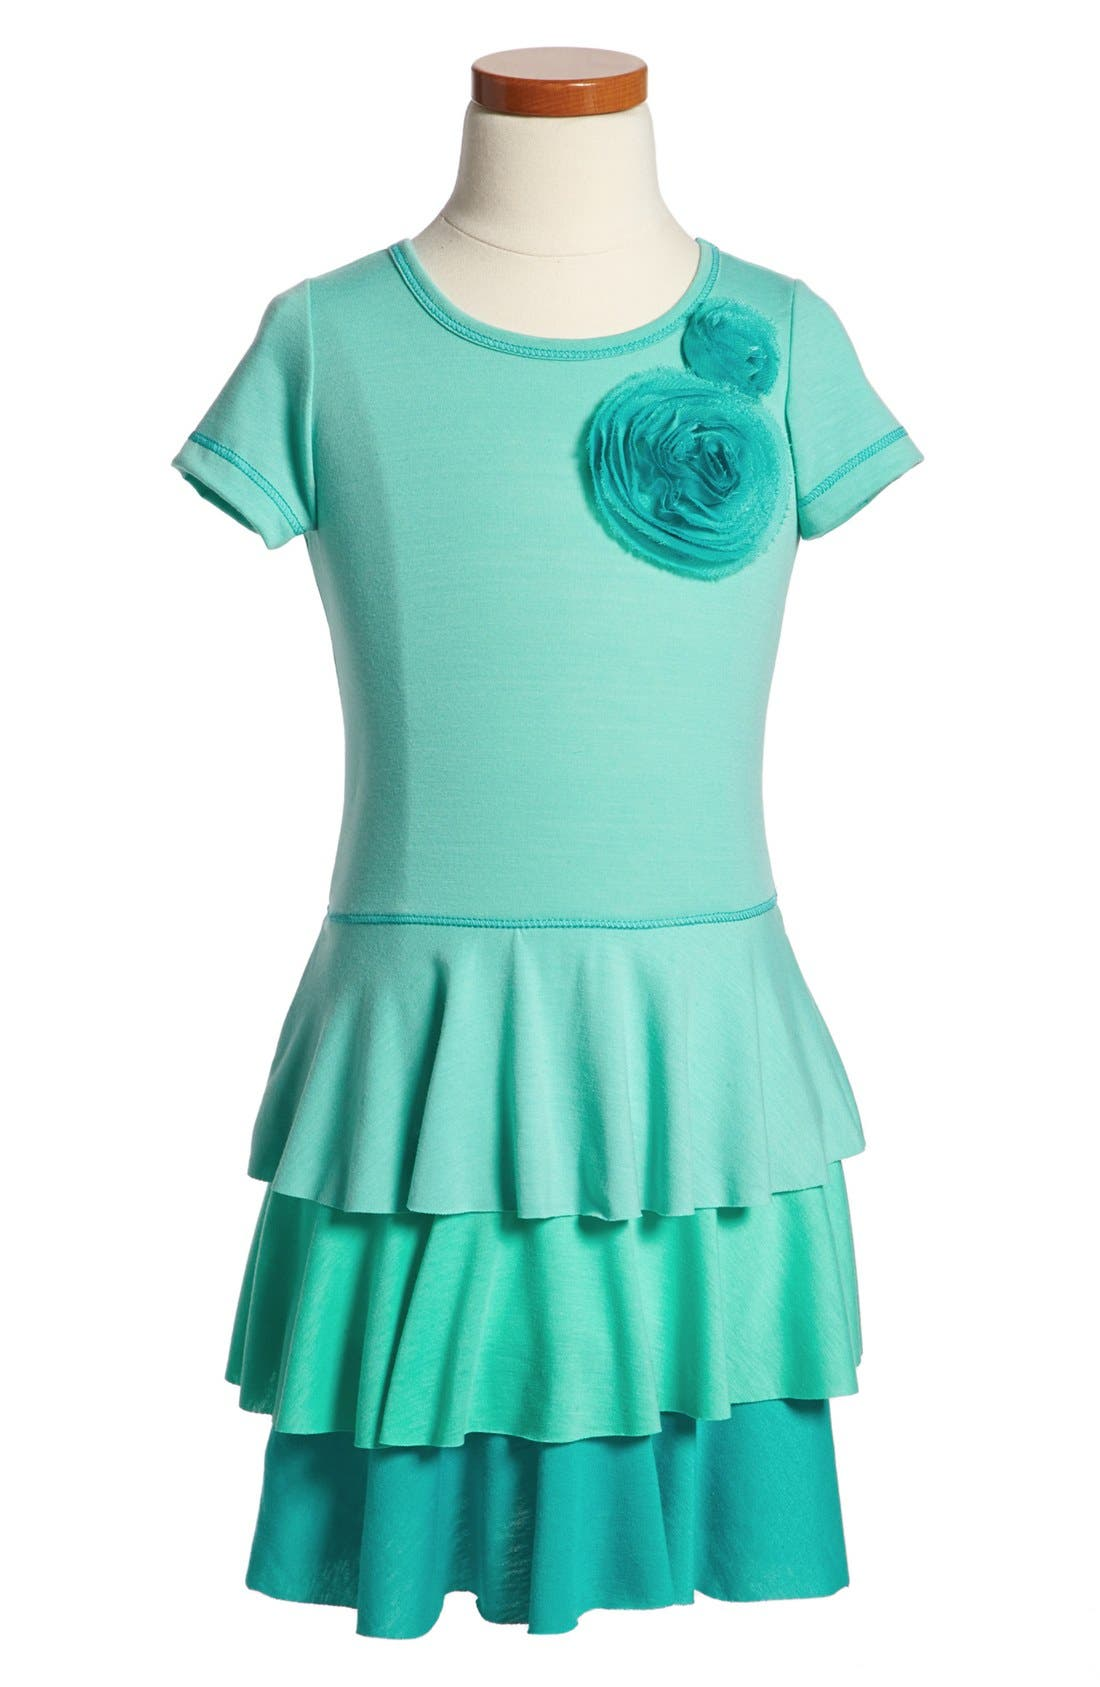 Alternate Image 1 Selected - Pink Vanilla Tiered Dress (Little Girls)